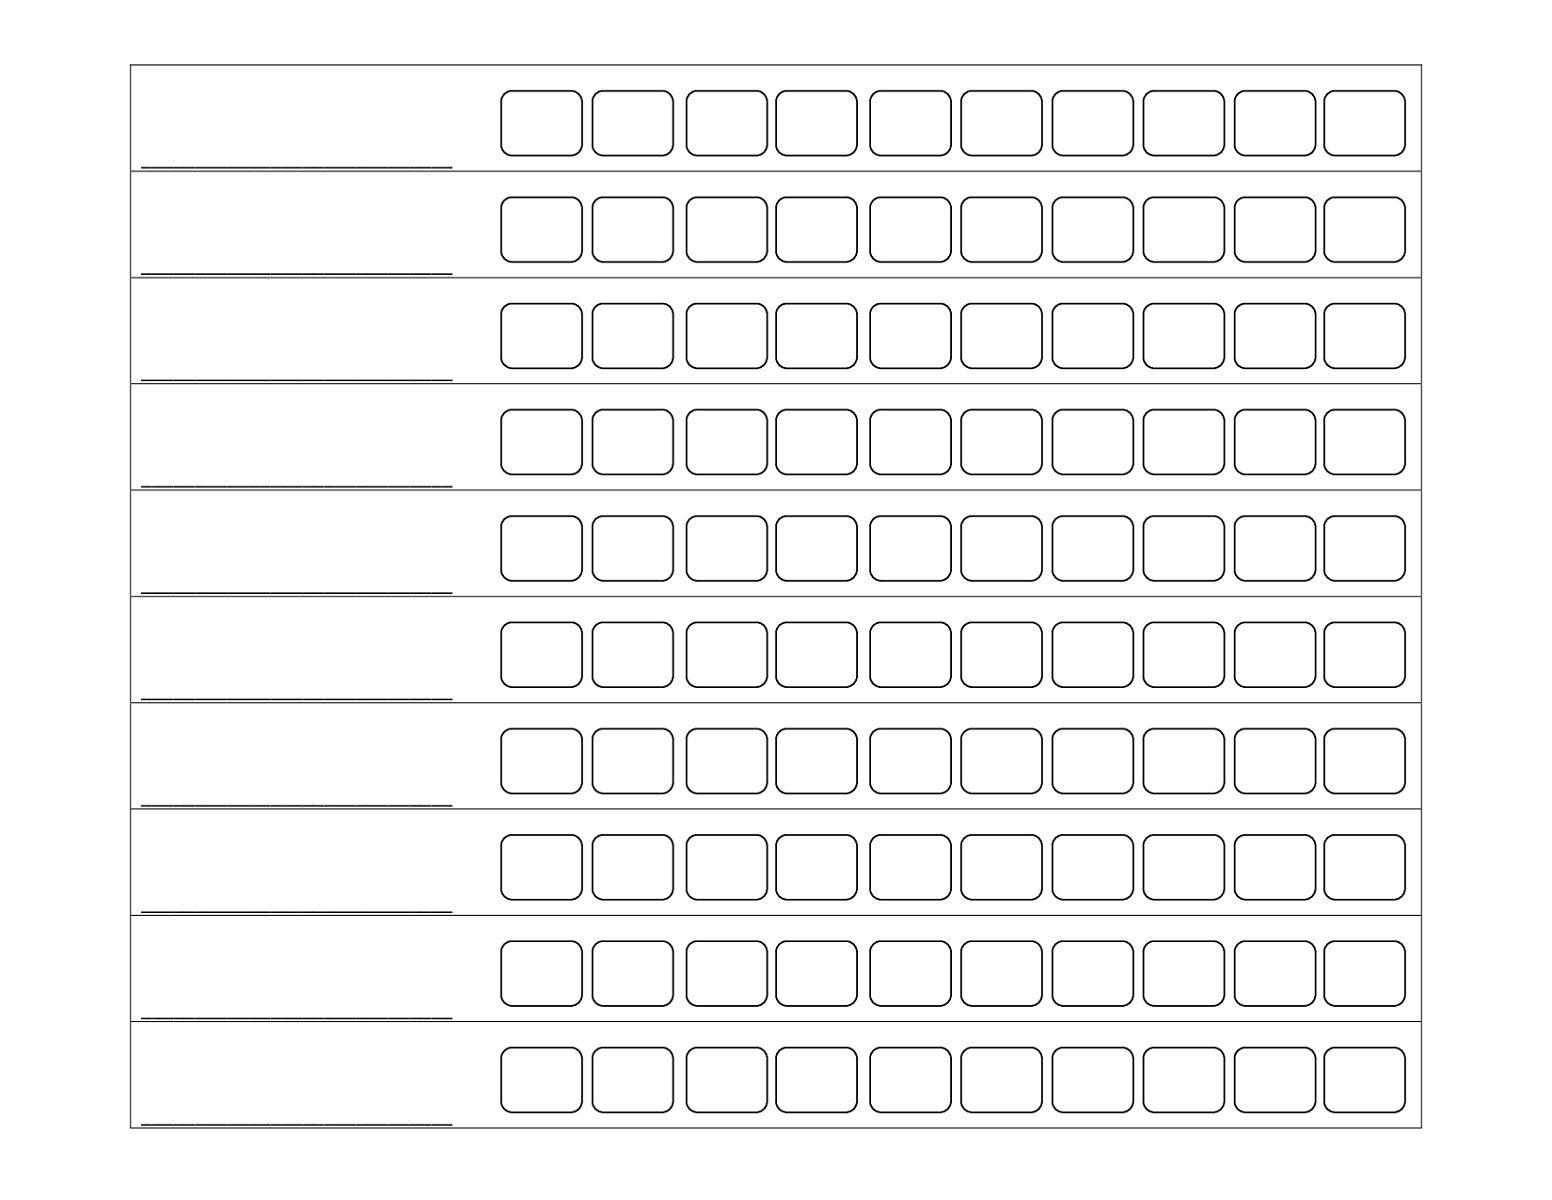 Printable Behavior Reward Chart